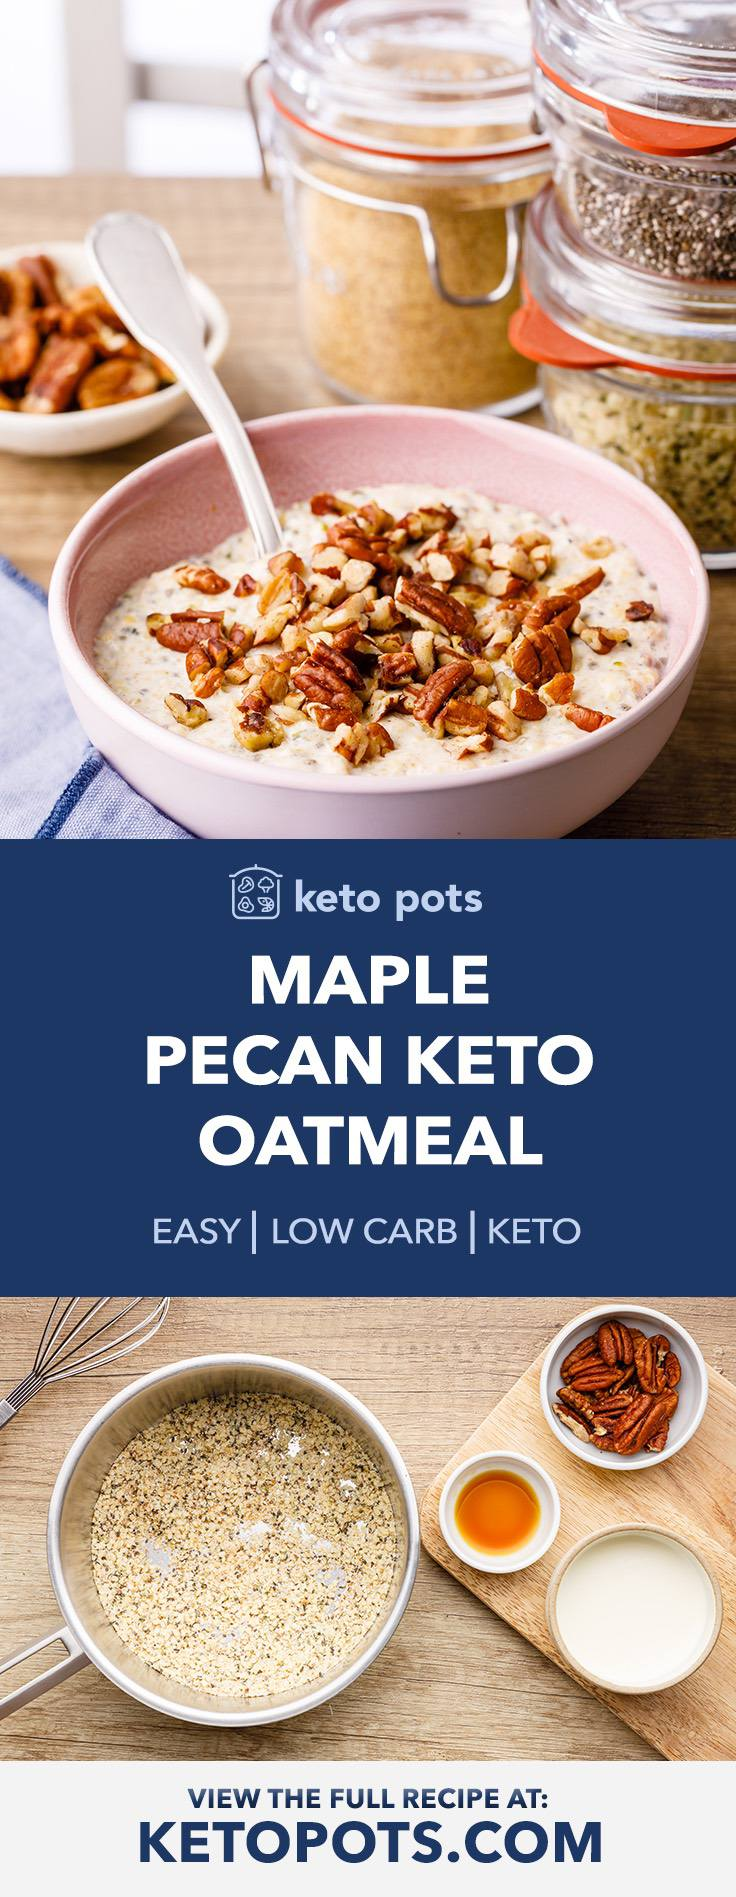 Crave-worthy Maple Pecan Keto Oatmeal